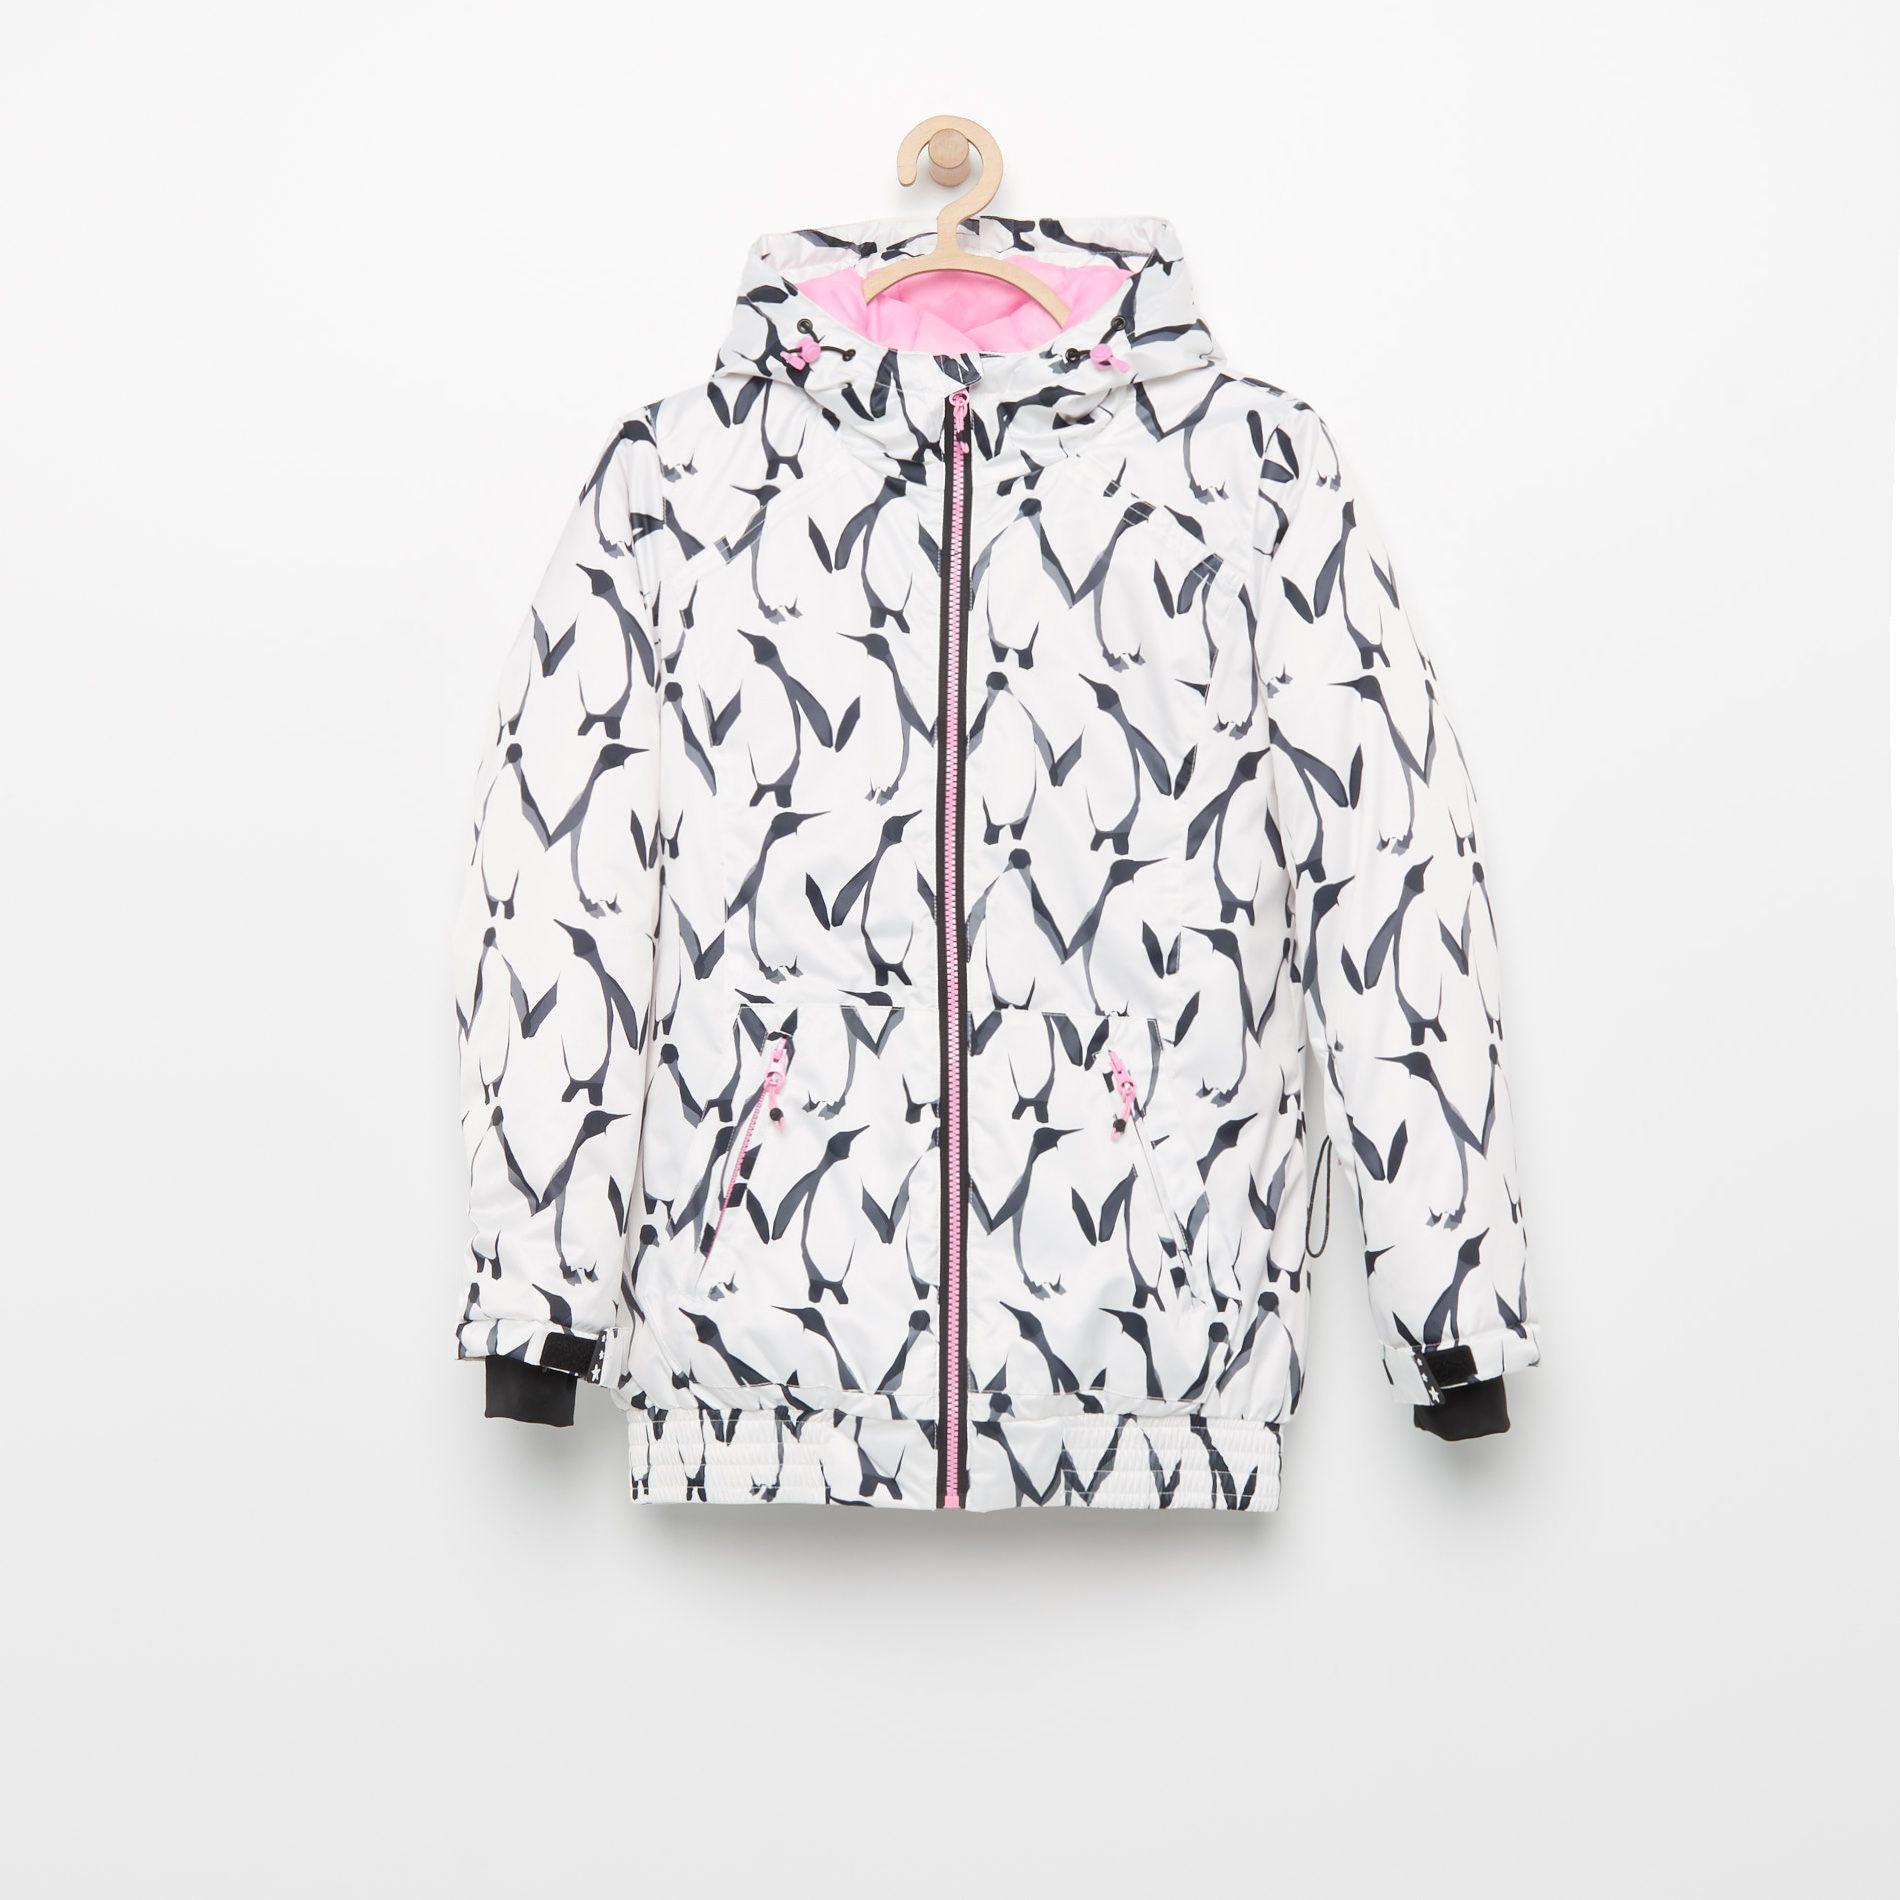 Kurtka Narciarska Reserved Winter Jackets Ski Jacket Jackets